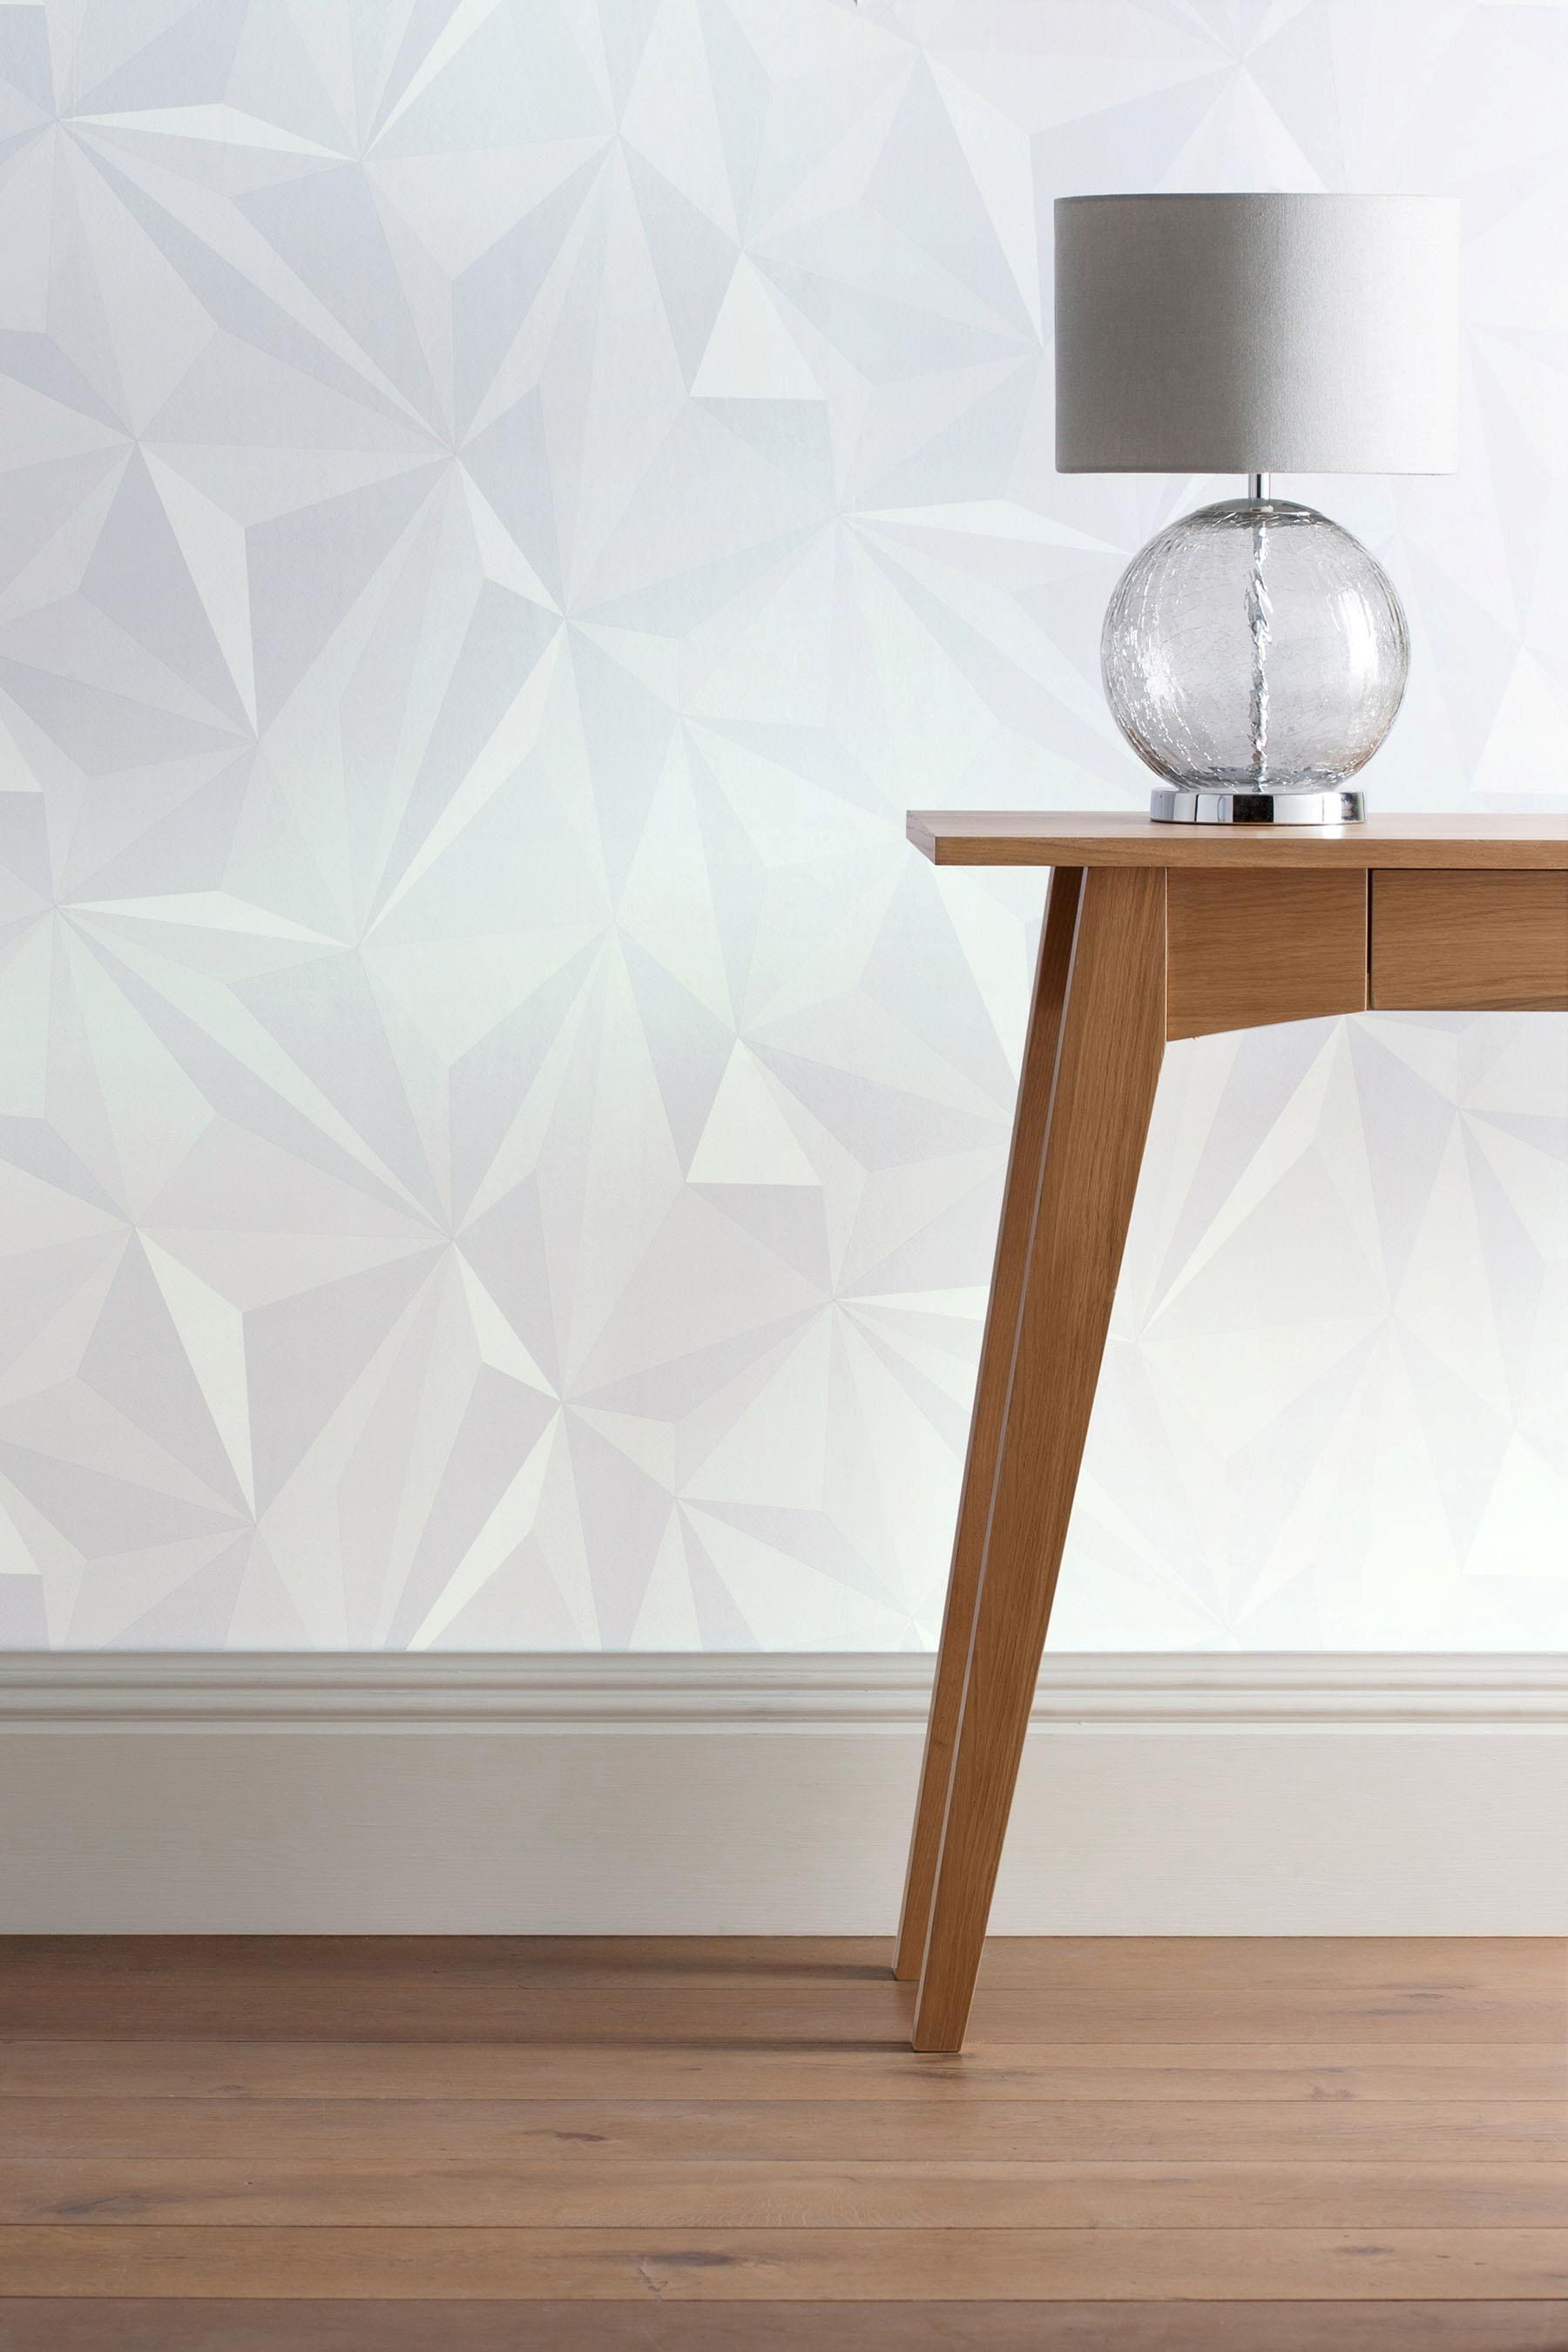 Next Bedroom Wallpaper Buy Origami Effect Wallpaper From The Next Uk Online Shop Lounge